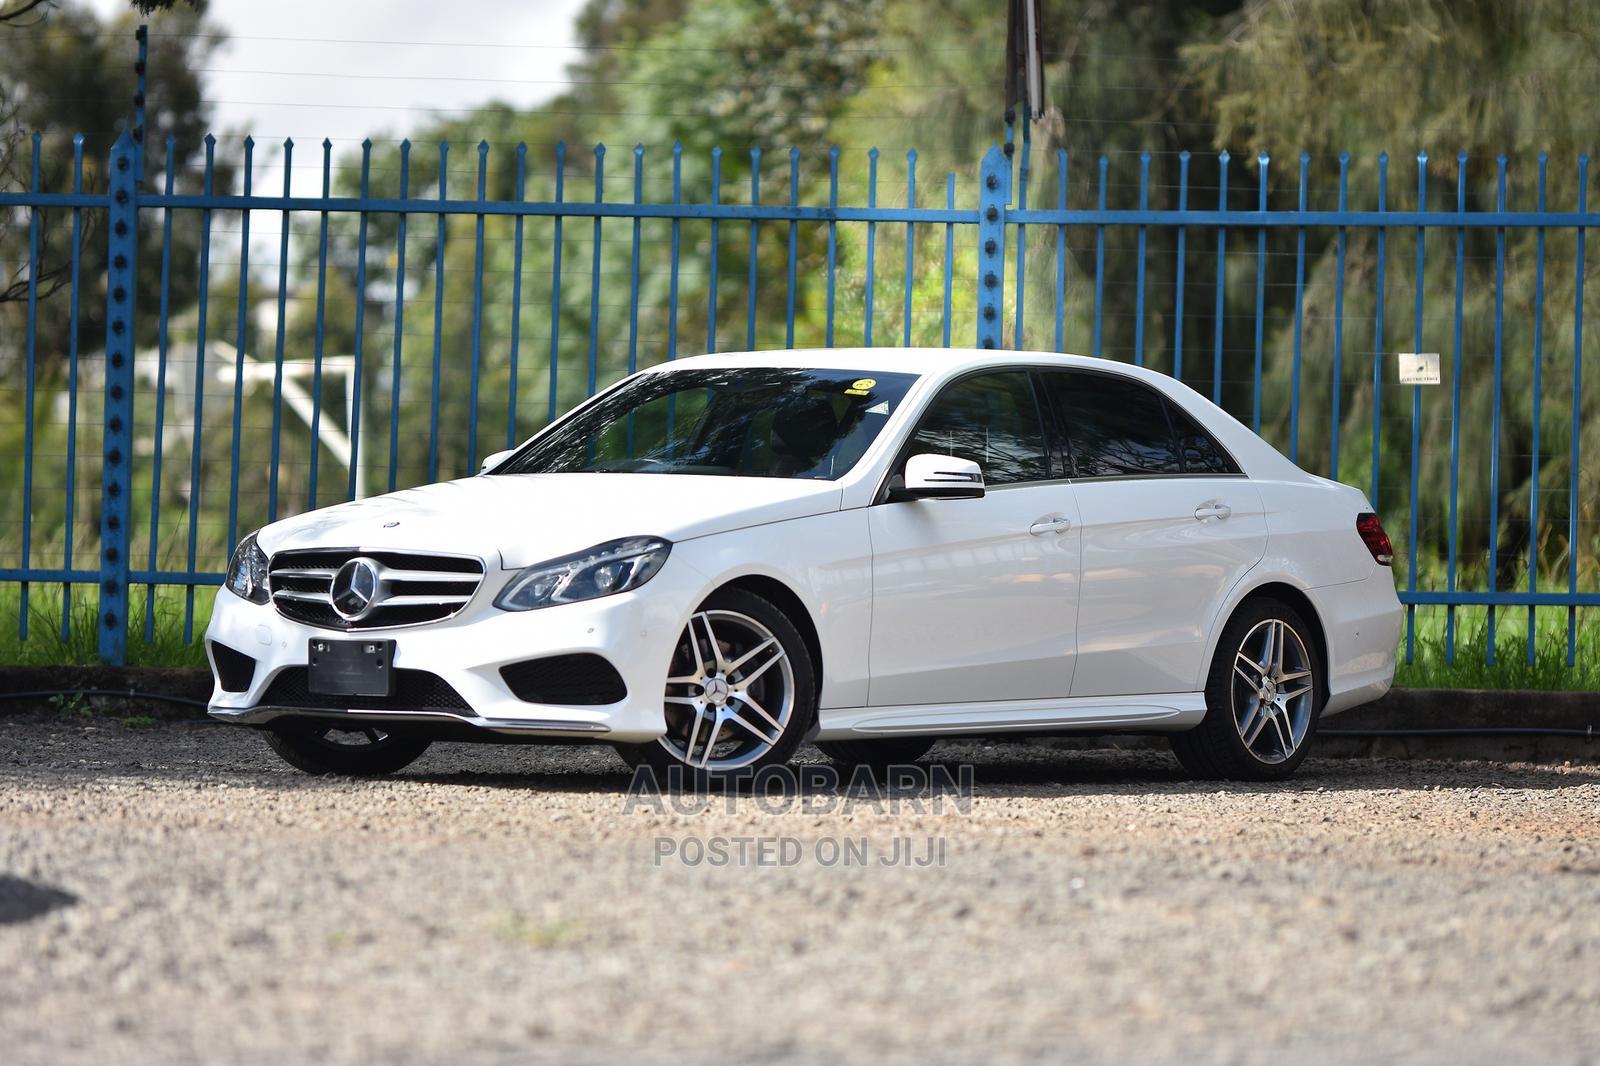 Mercedes-Benz E250 2014 White | Cars for sale in Kilimani, Nairobi, Kenya